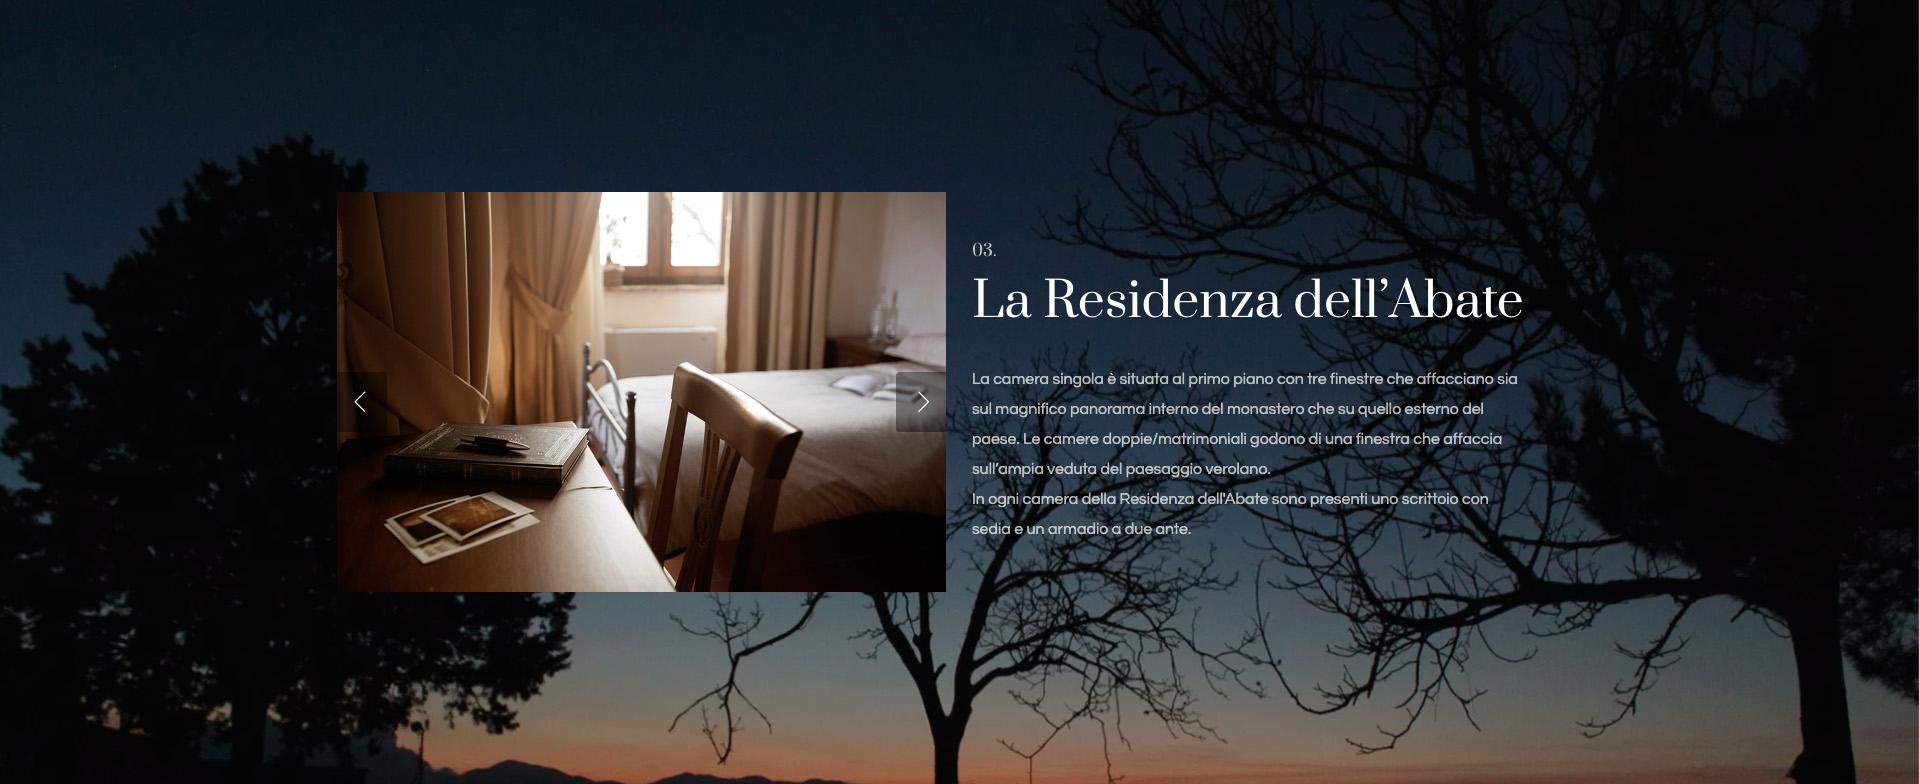 Giorgi Design Studio - Monastero San Erasmo - Web Design - La Residenza dell'Abate